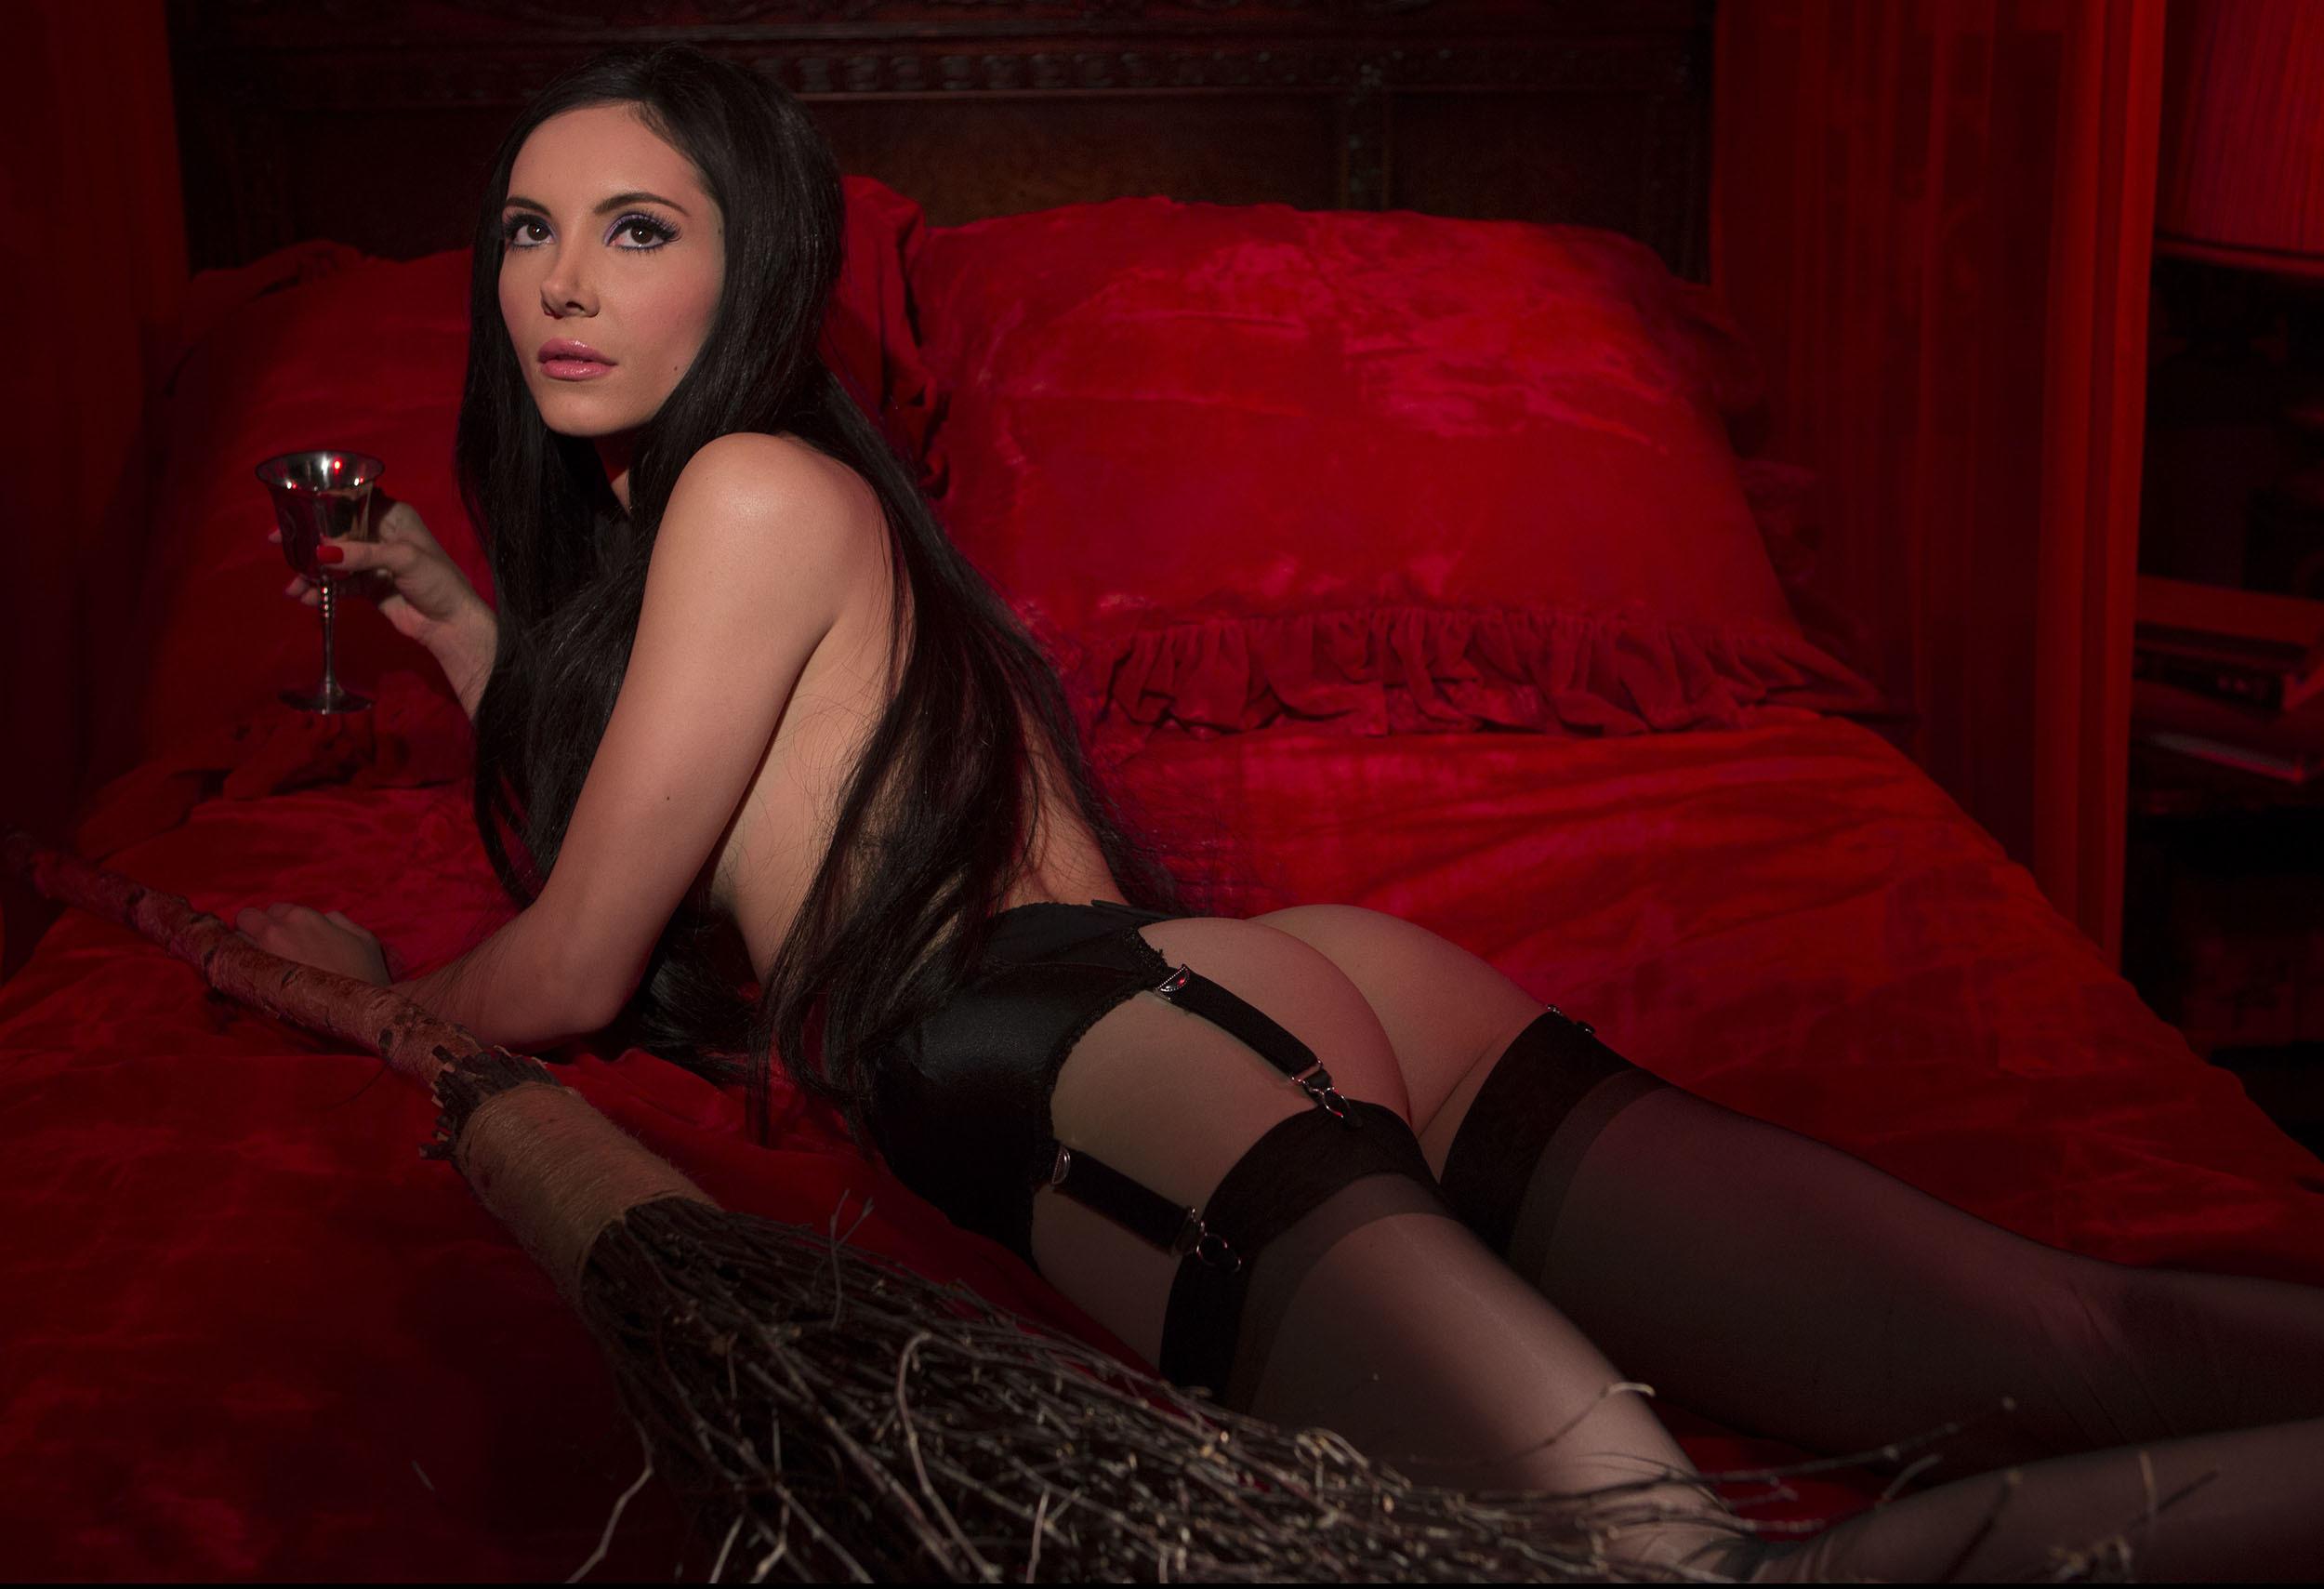 filmy z seksem z kreskówek Lesben porno za darmo